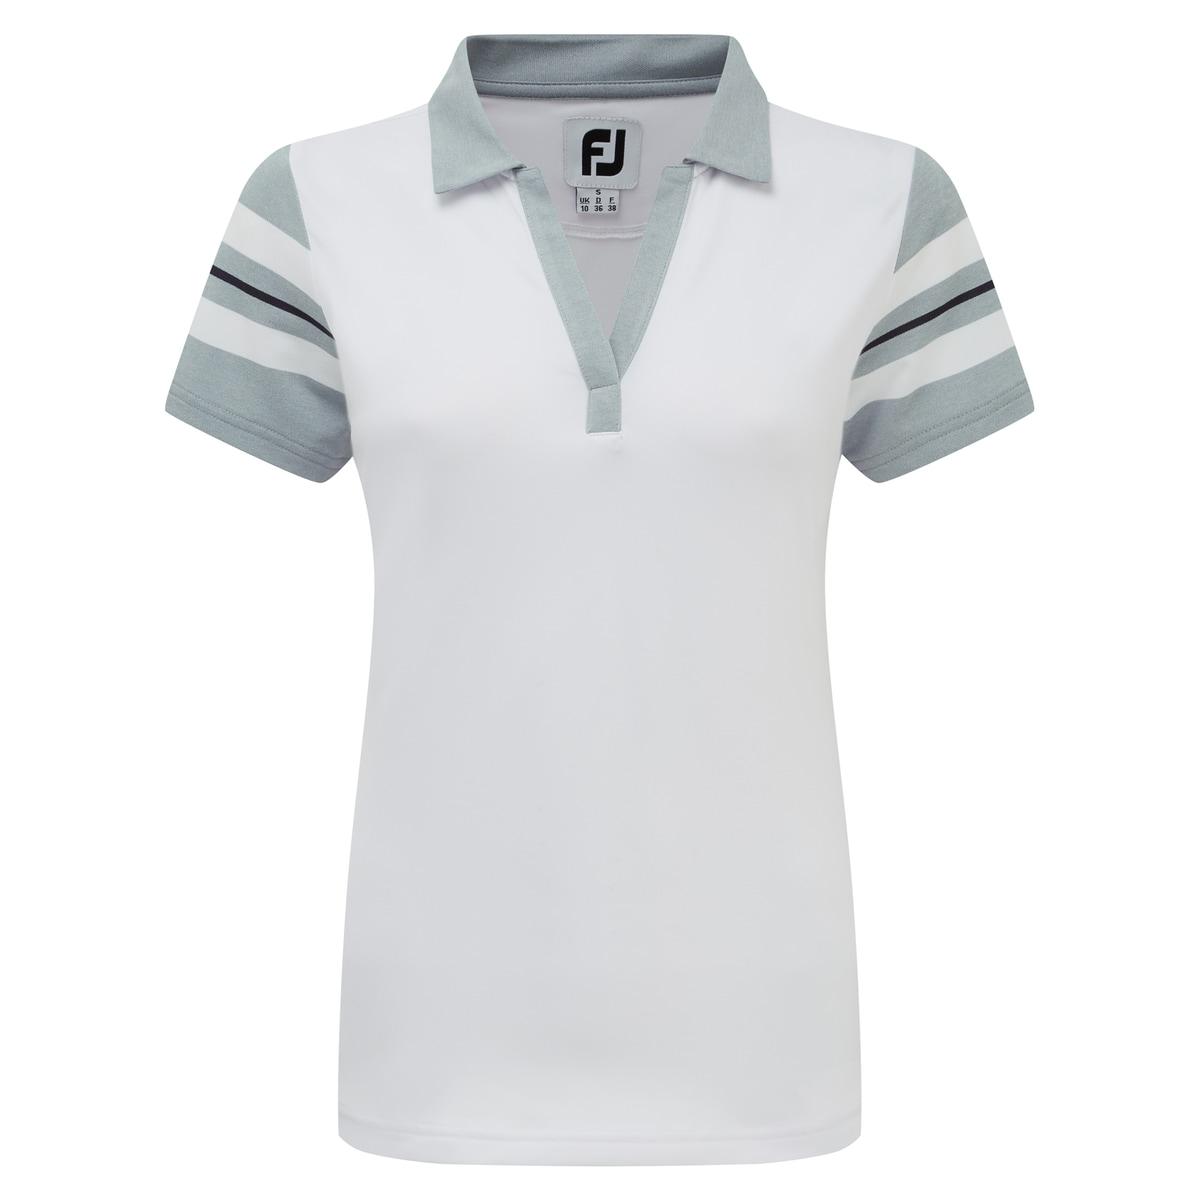 Baby Pique Sleeve Stripe Shirts Women